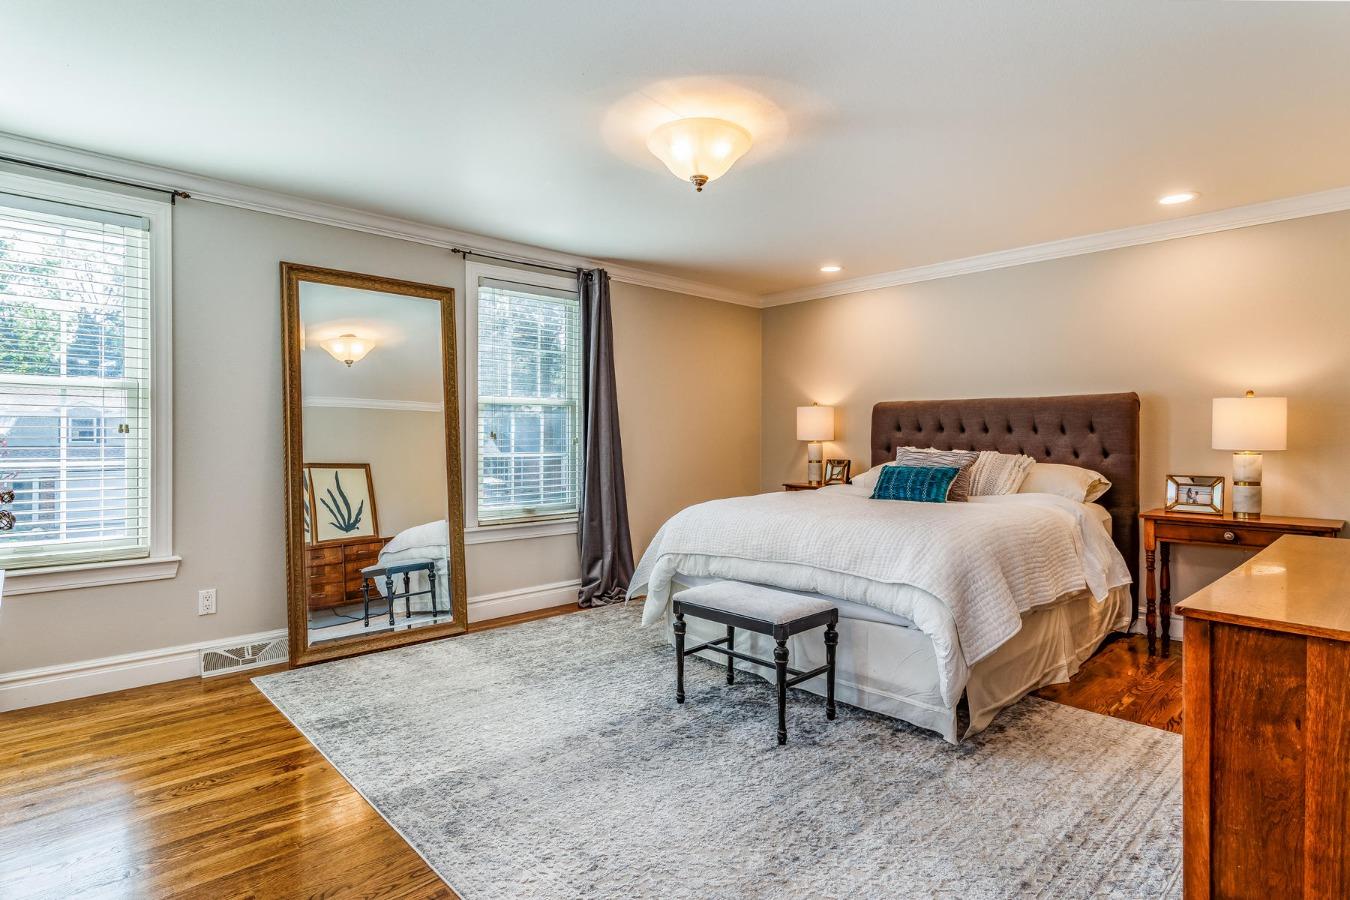 Huge Master Suite with Walk-in Closet